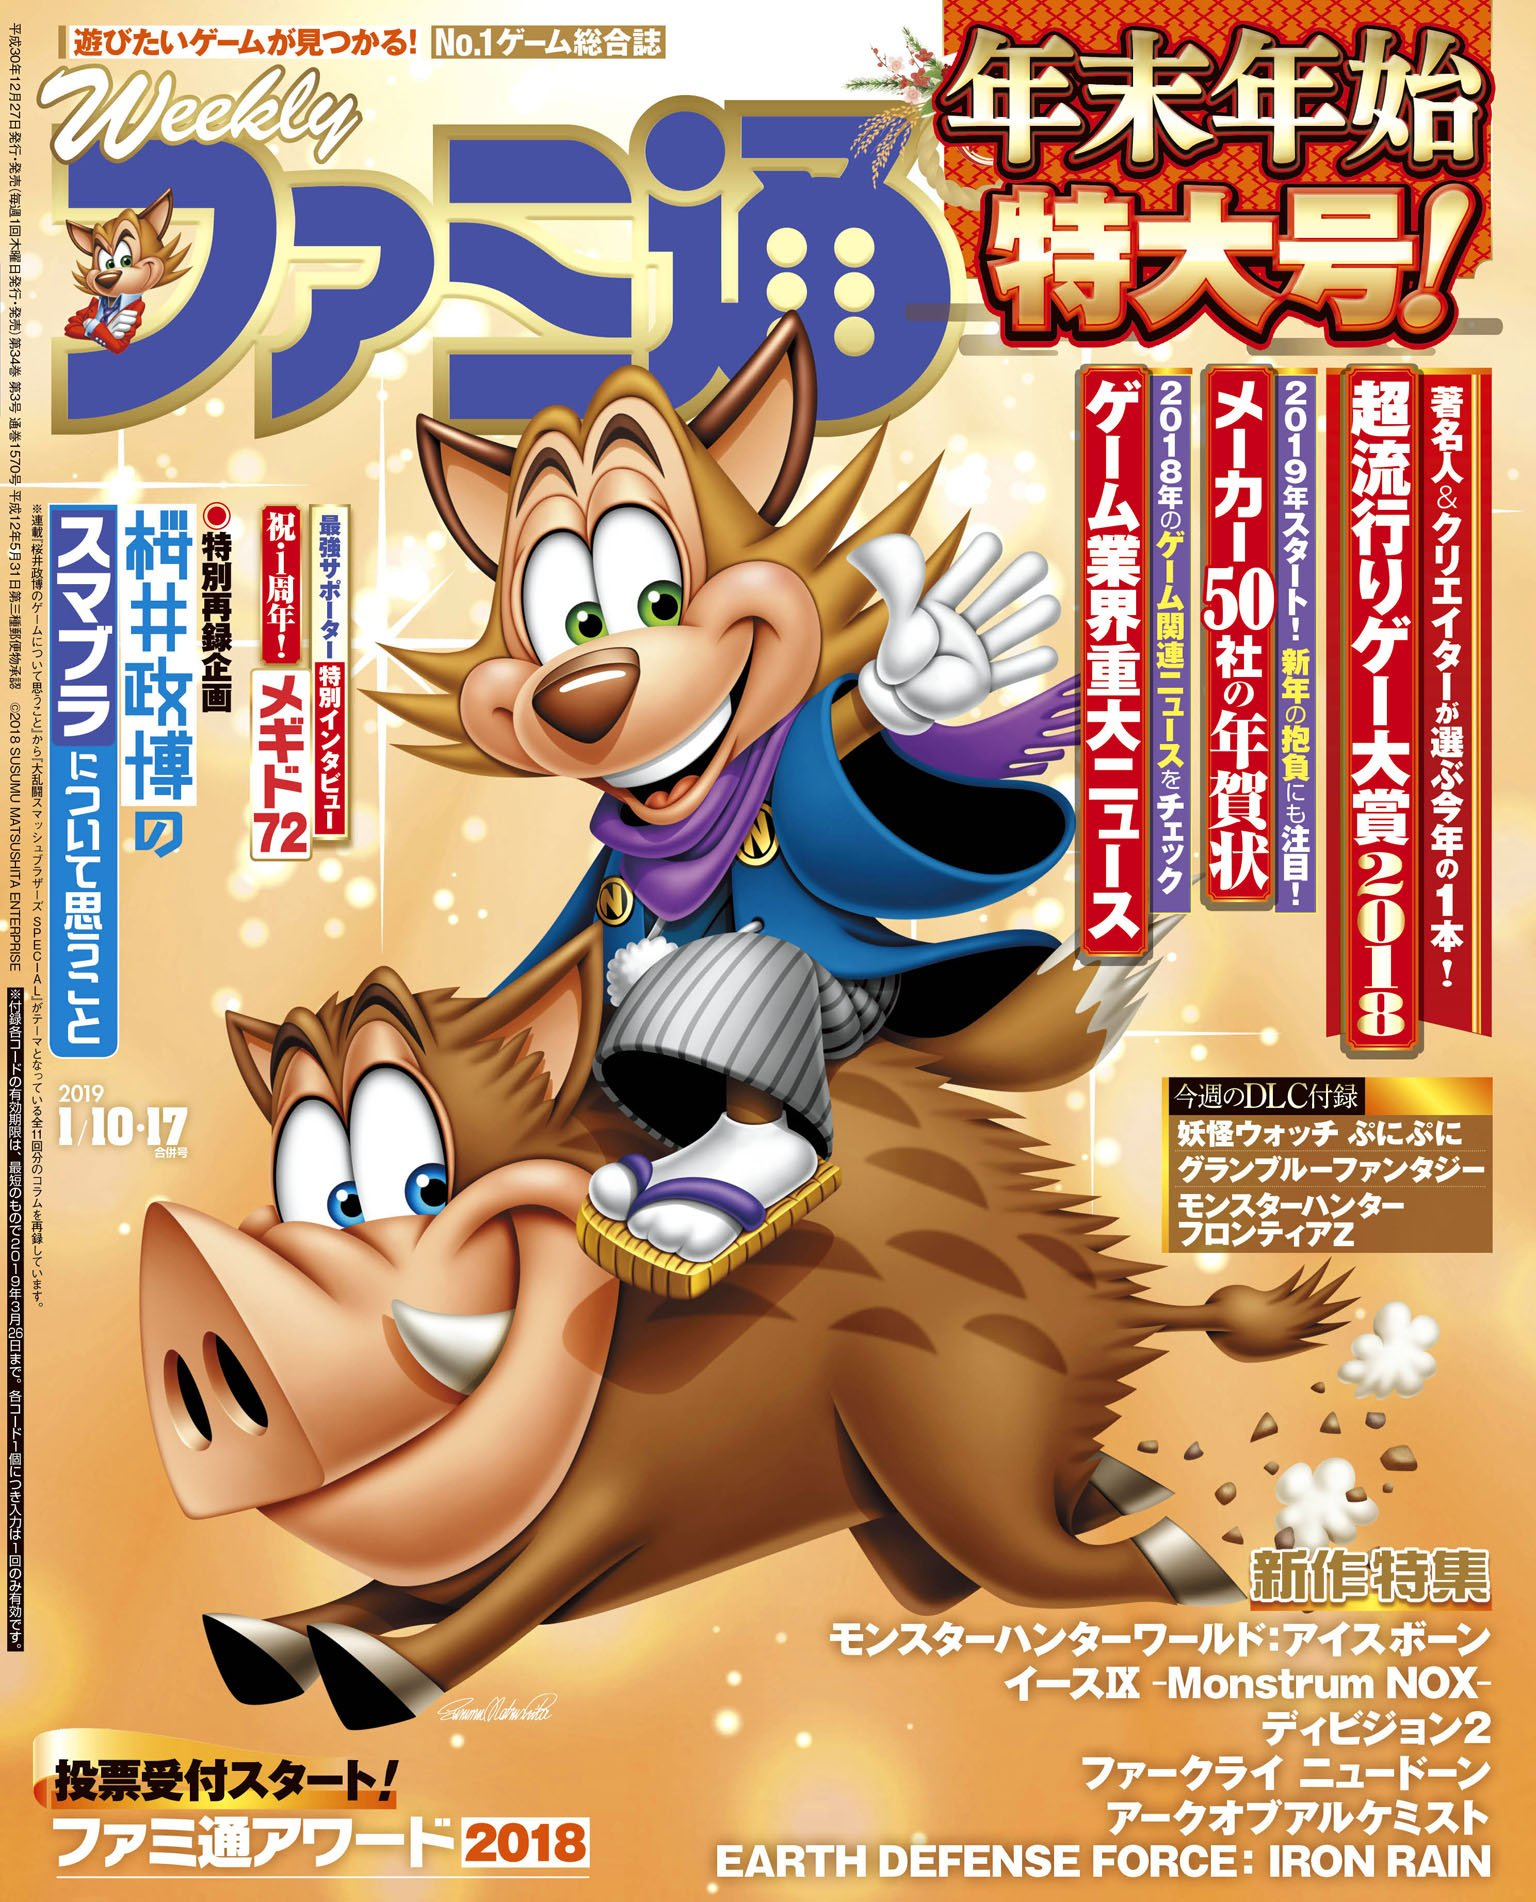 Famitsu 1569/1570 (January 10/17, 2019)